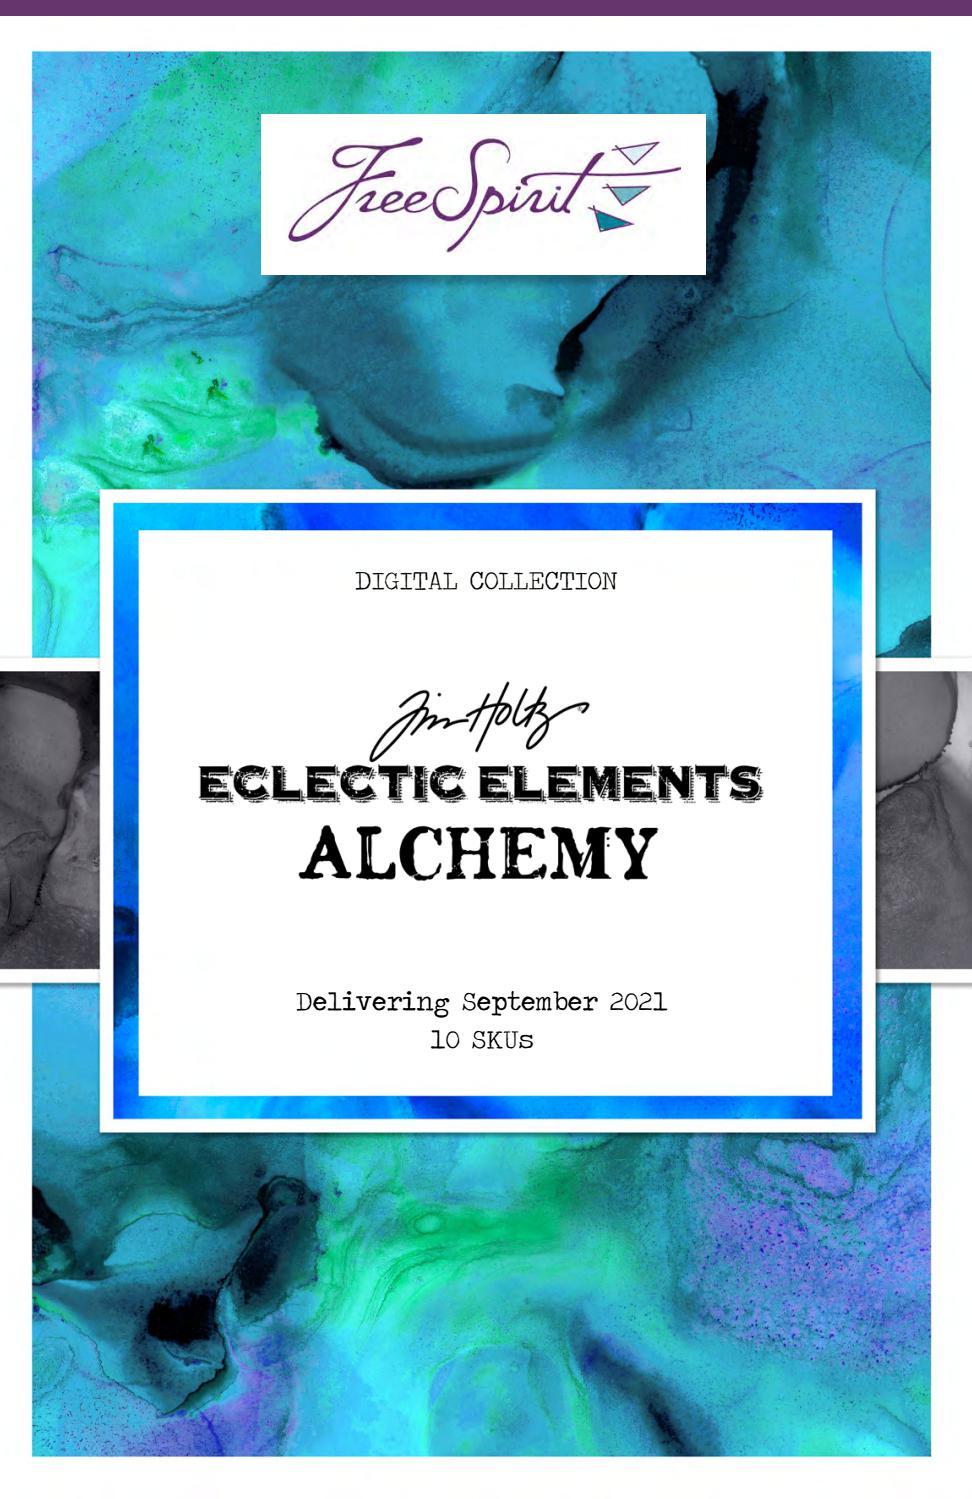 FreeSpirit PWTH115.8sepi Tim Holtz Eclectic Elements Sepia Provisions